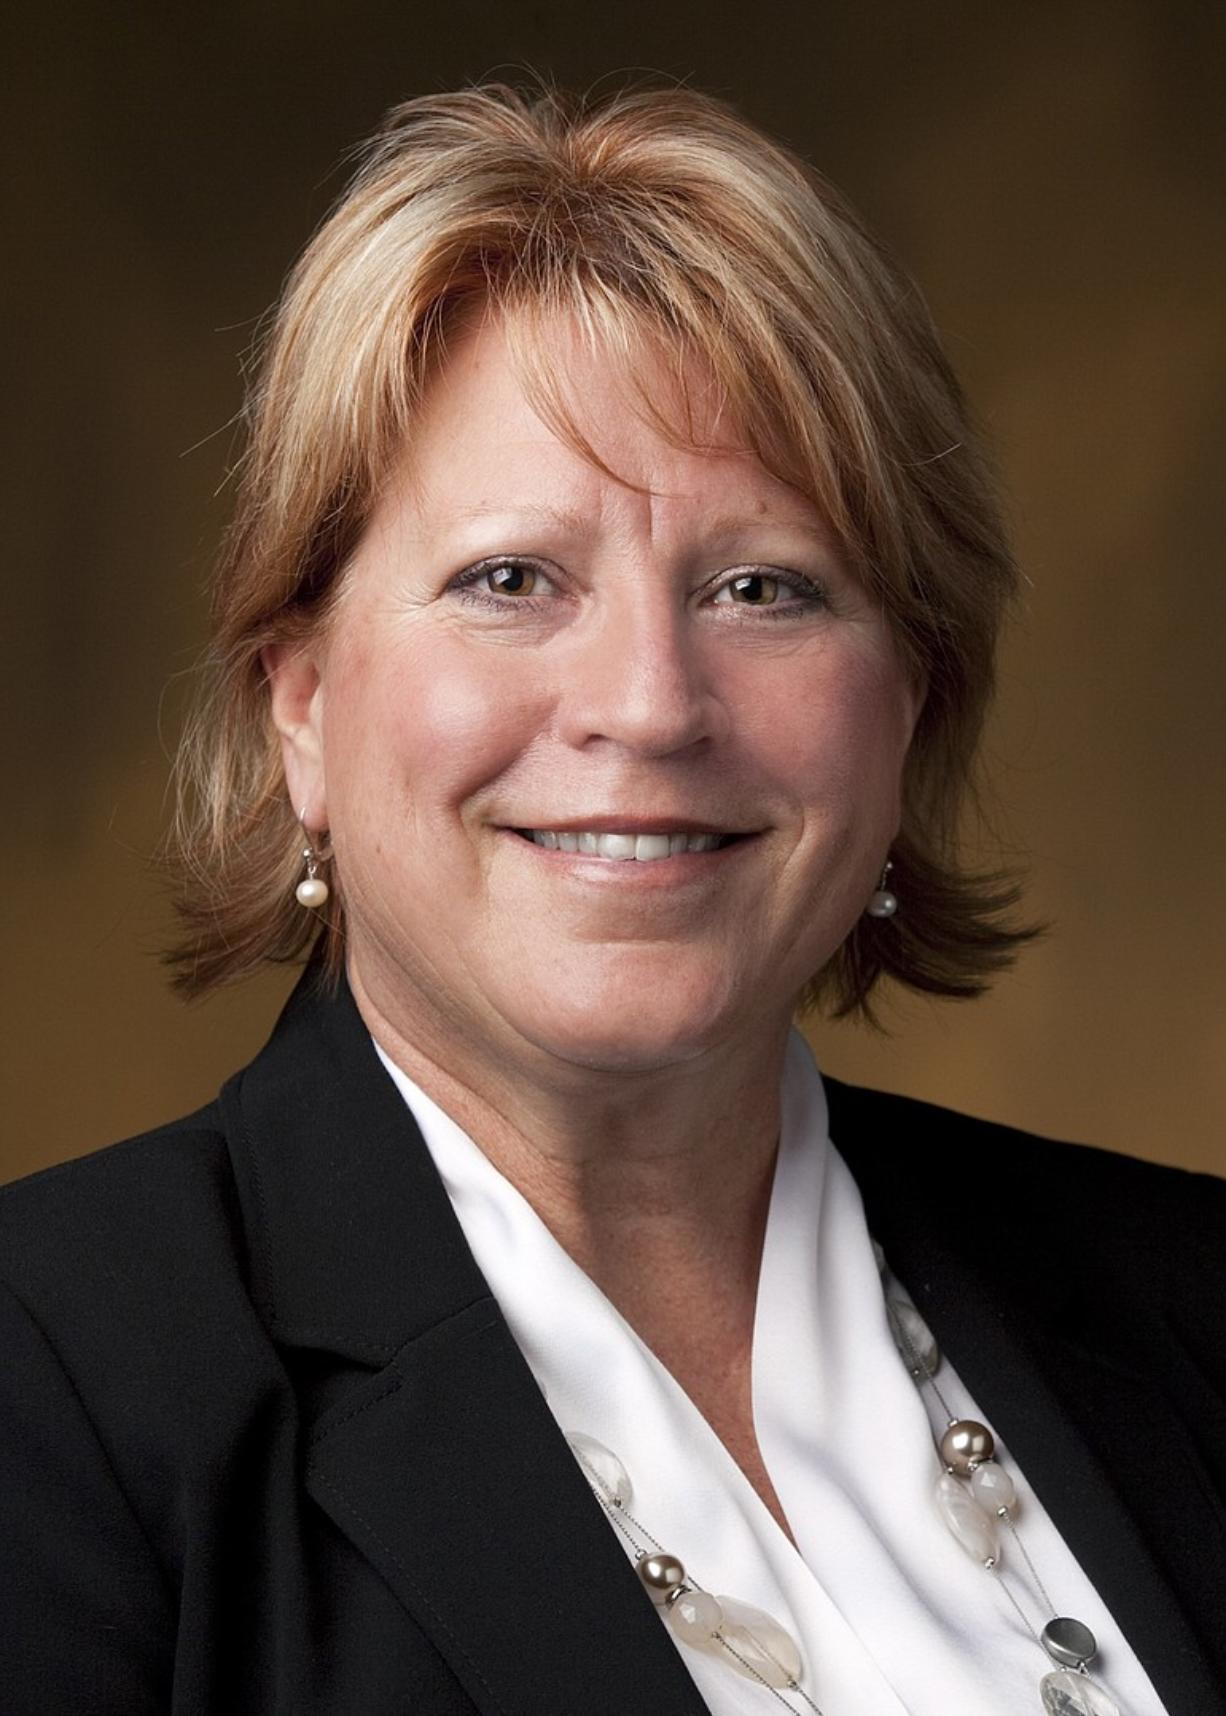 Elizabeth Uelmen, Democratic candidate for 3rd Congressional District